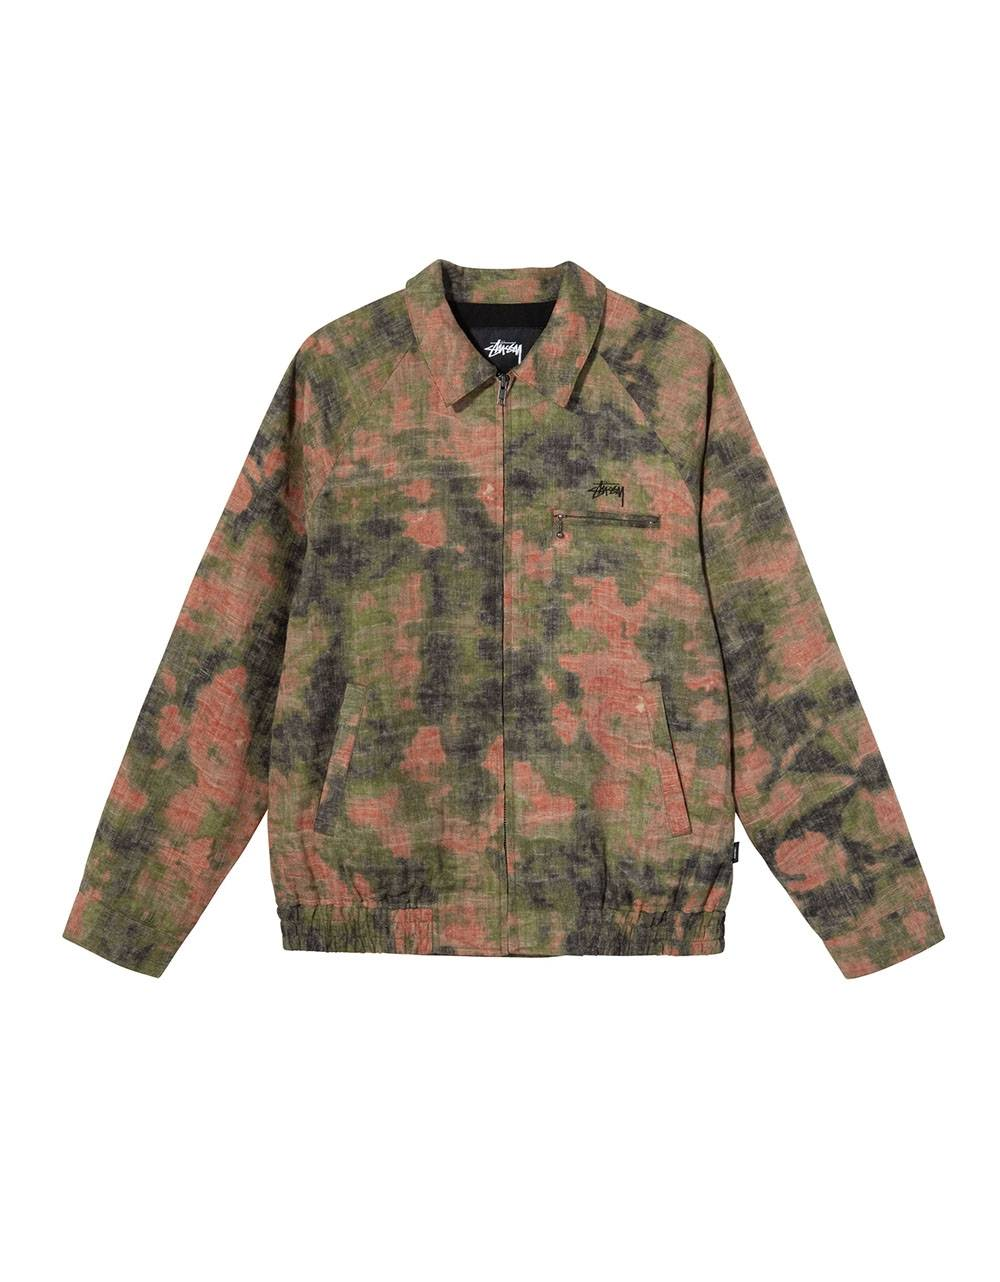 Stussy reverse jacquard bryan jacket - floral Stussy Jacket 171,31€